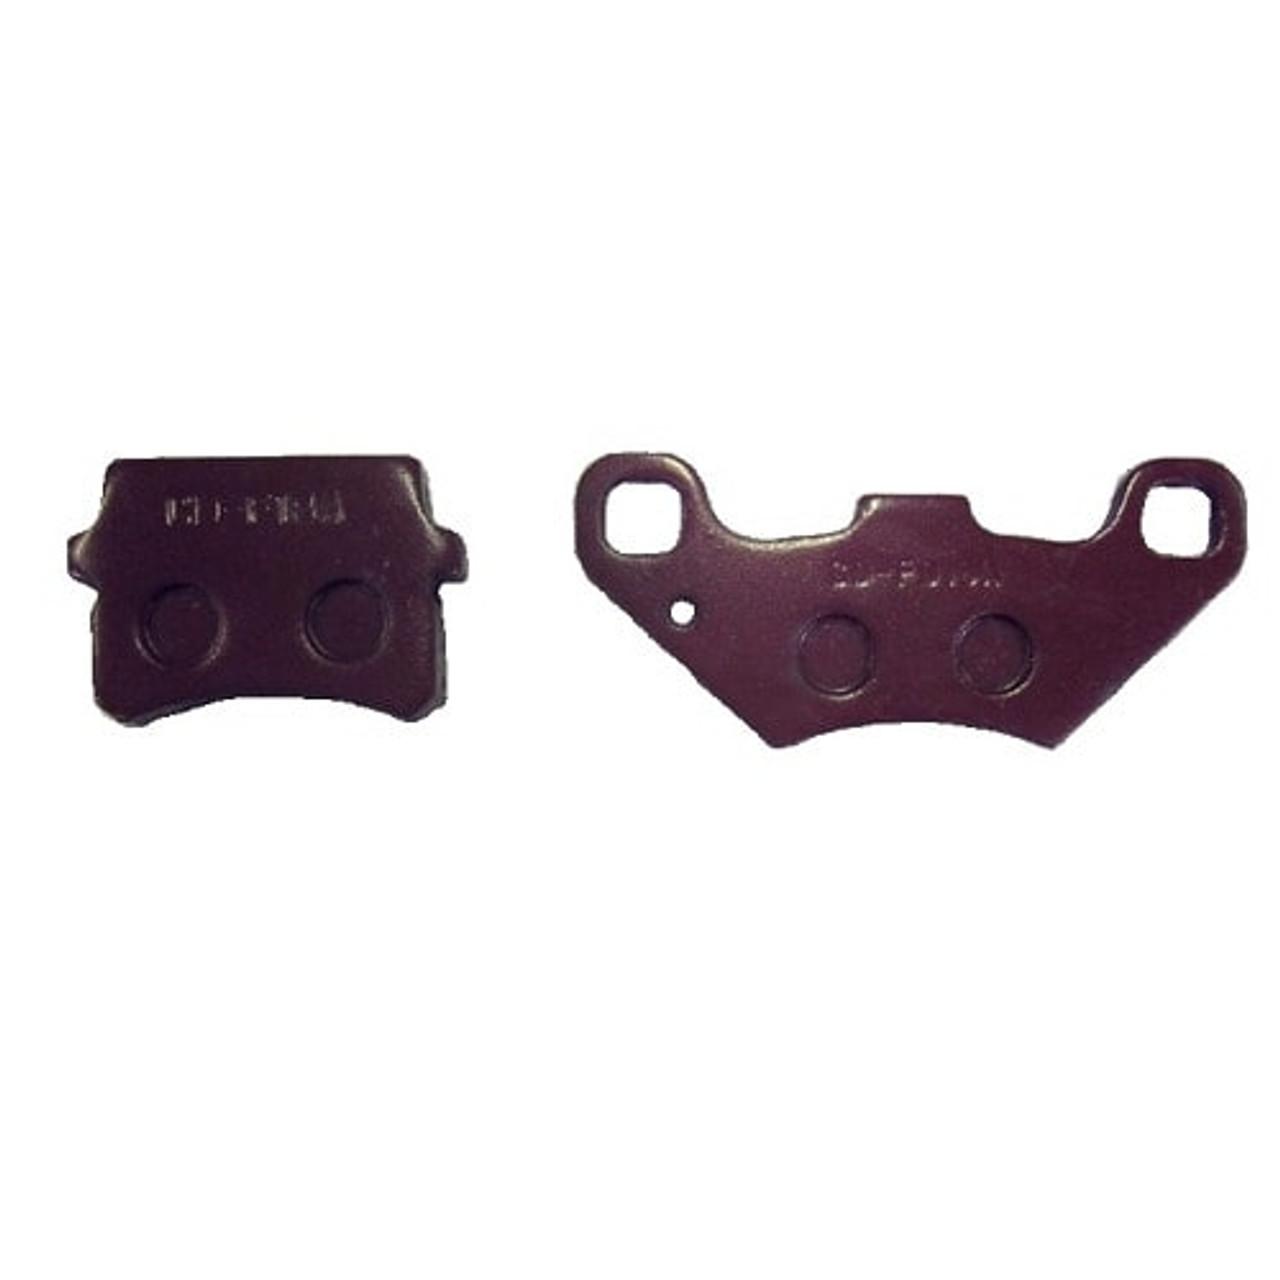 BRAKE CALIPER PAD SET for TrailMaster MID XRS, MID XRX, 150 XRS, 150 XRX,300 XRX, Challenger UTV 150 and 300.